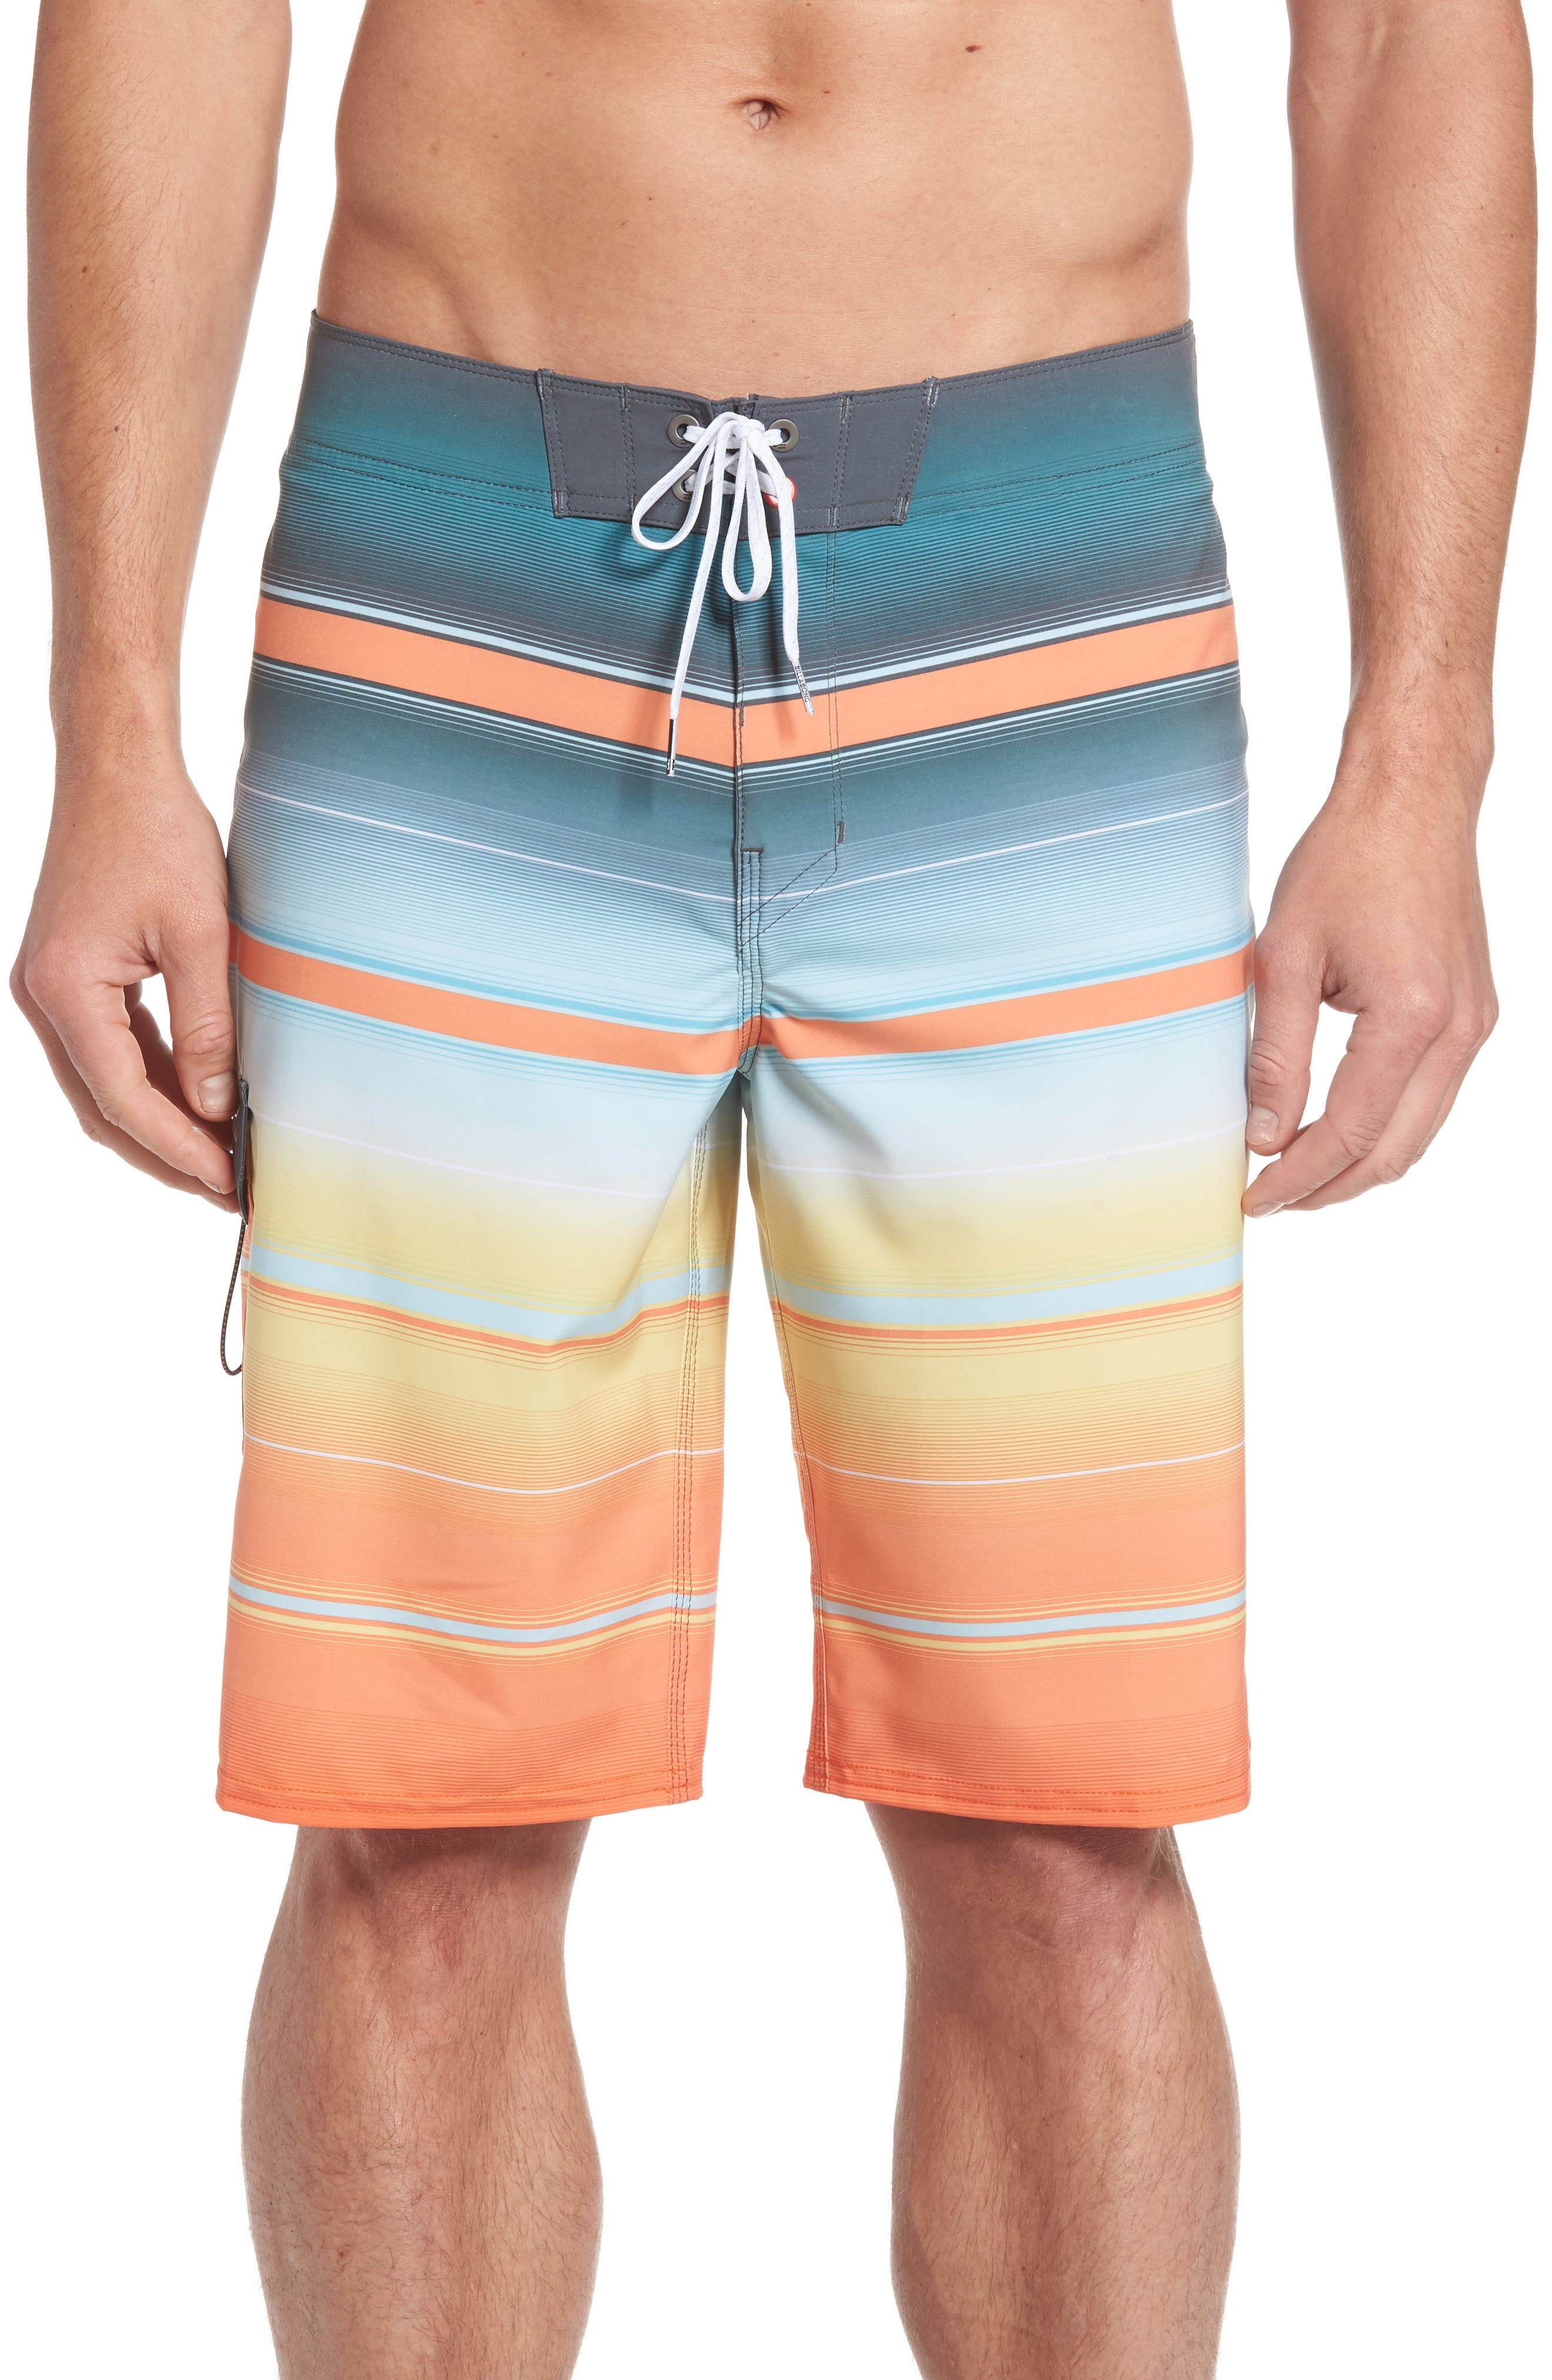 Alternate Image 1 Selected - Billabong All Day X Stripe Board Shorts (Regular & Big)